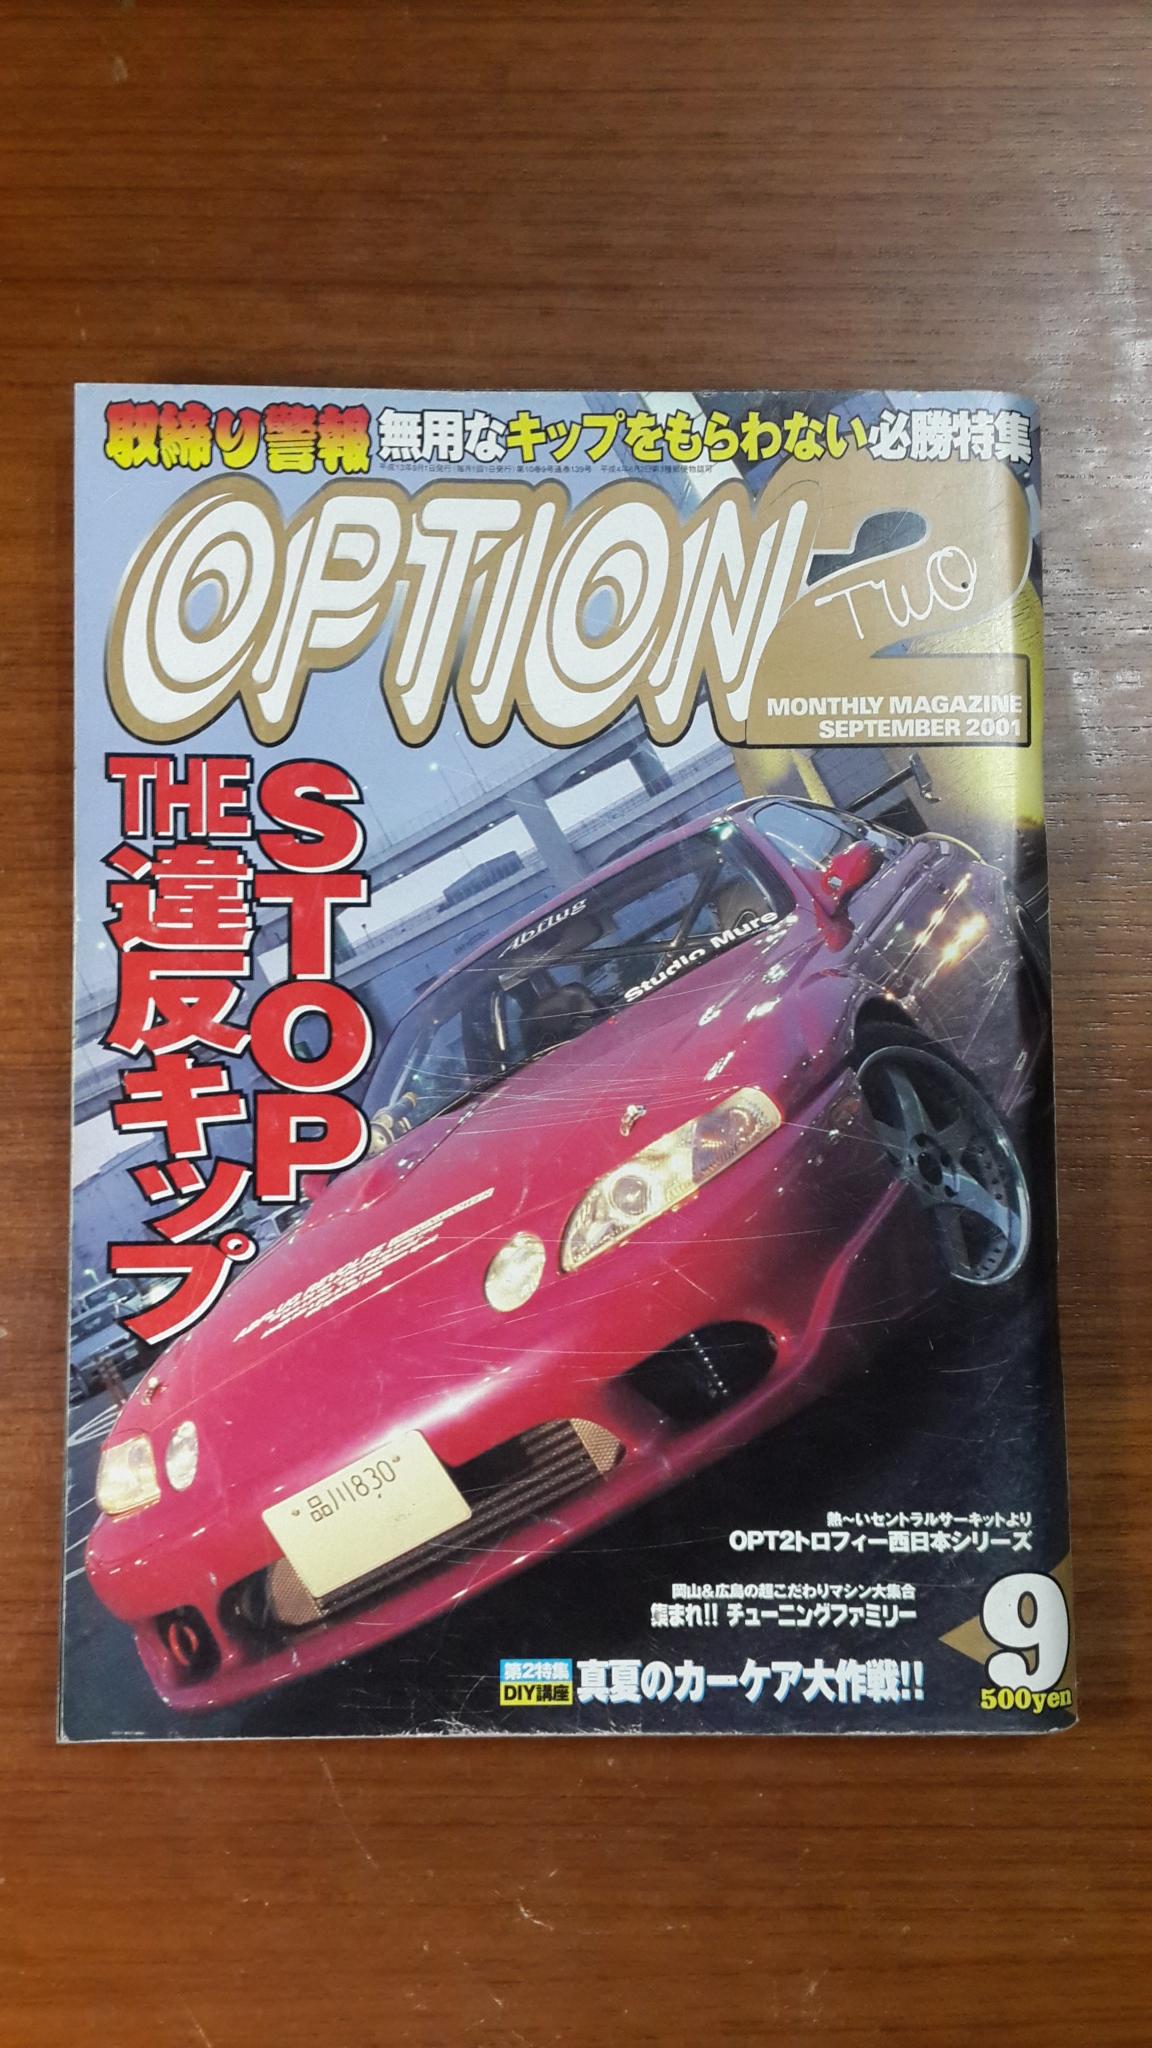 OPTION TWO 2 (Japan) : 2001 / 9